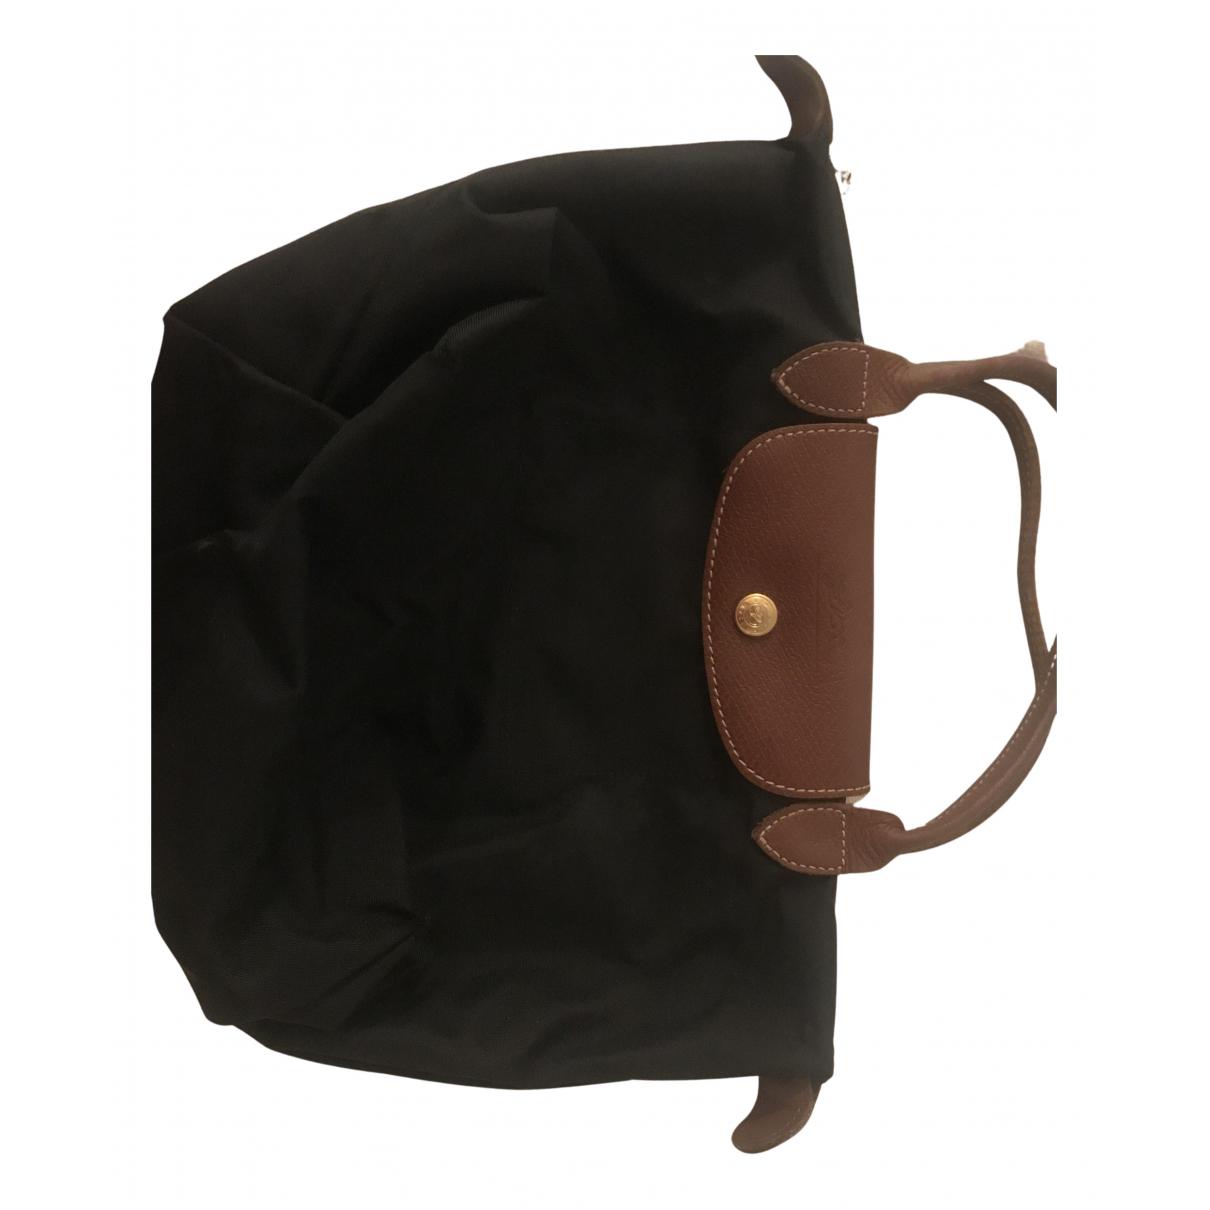 Longchamp Pliage  Black Cloth handbag for Women N